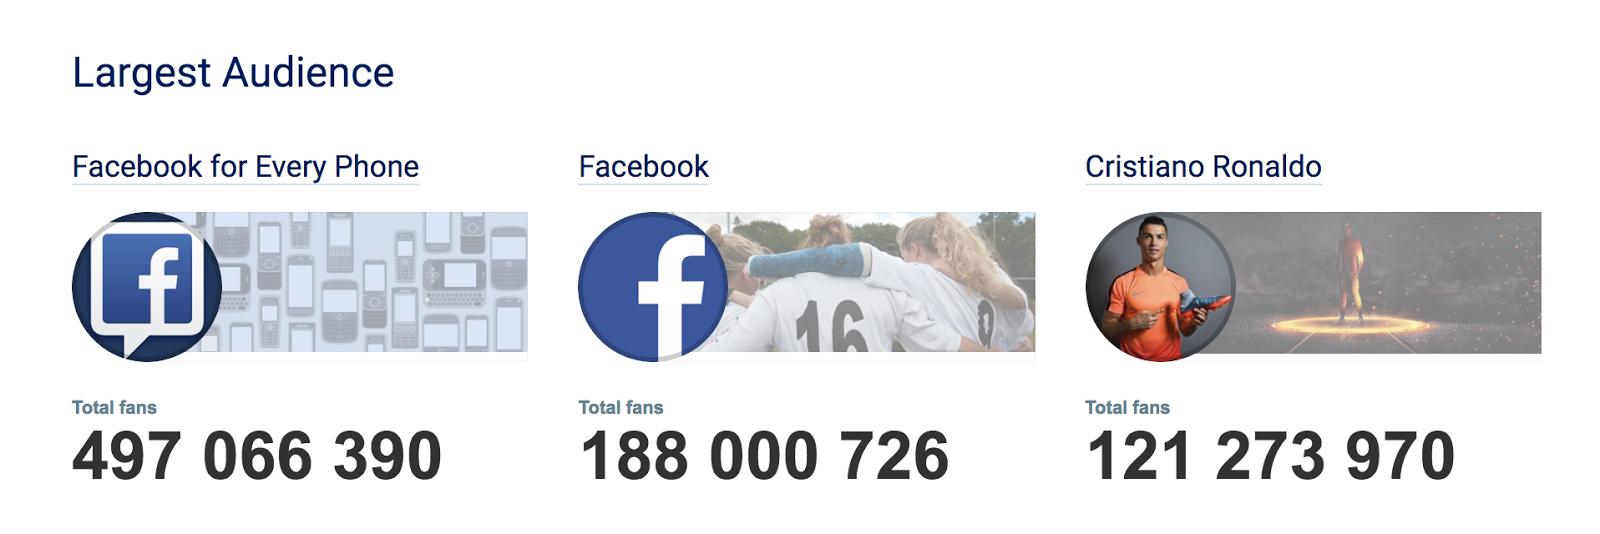 497,066,390 likes!!